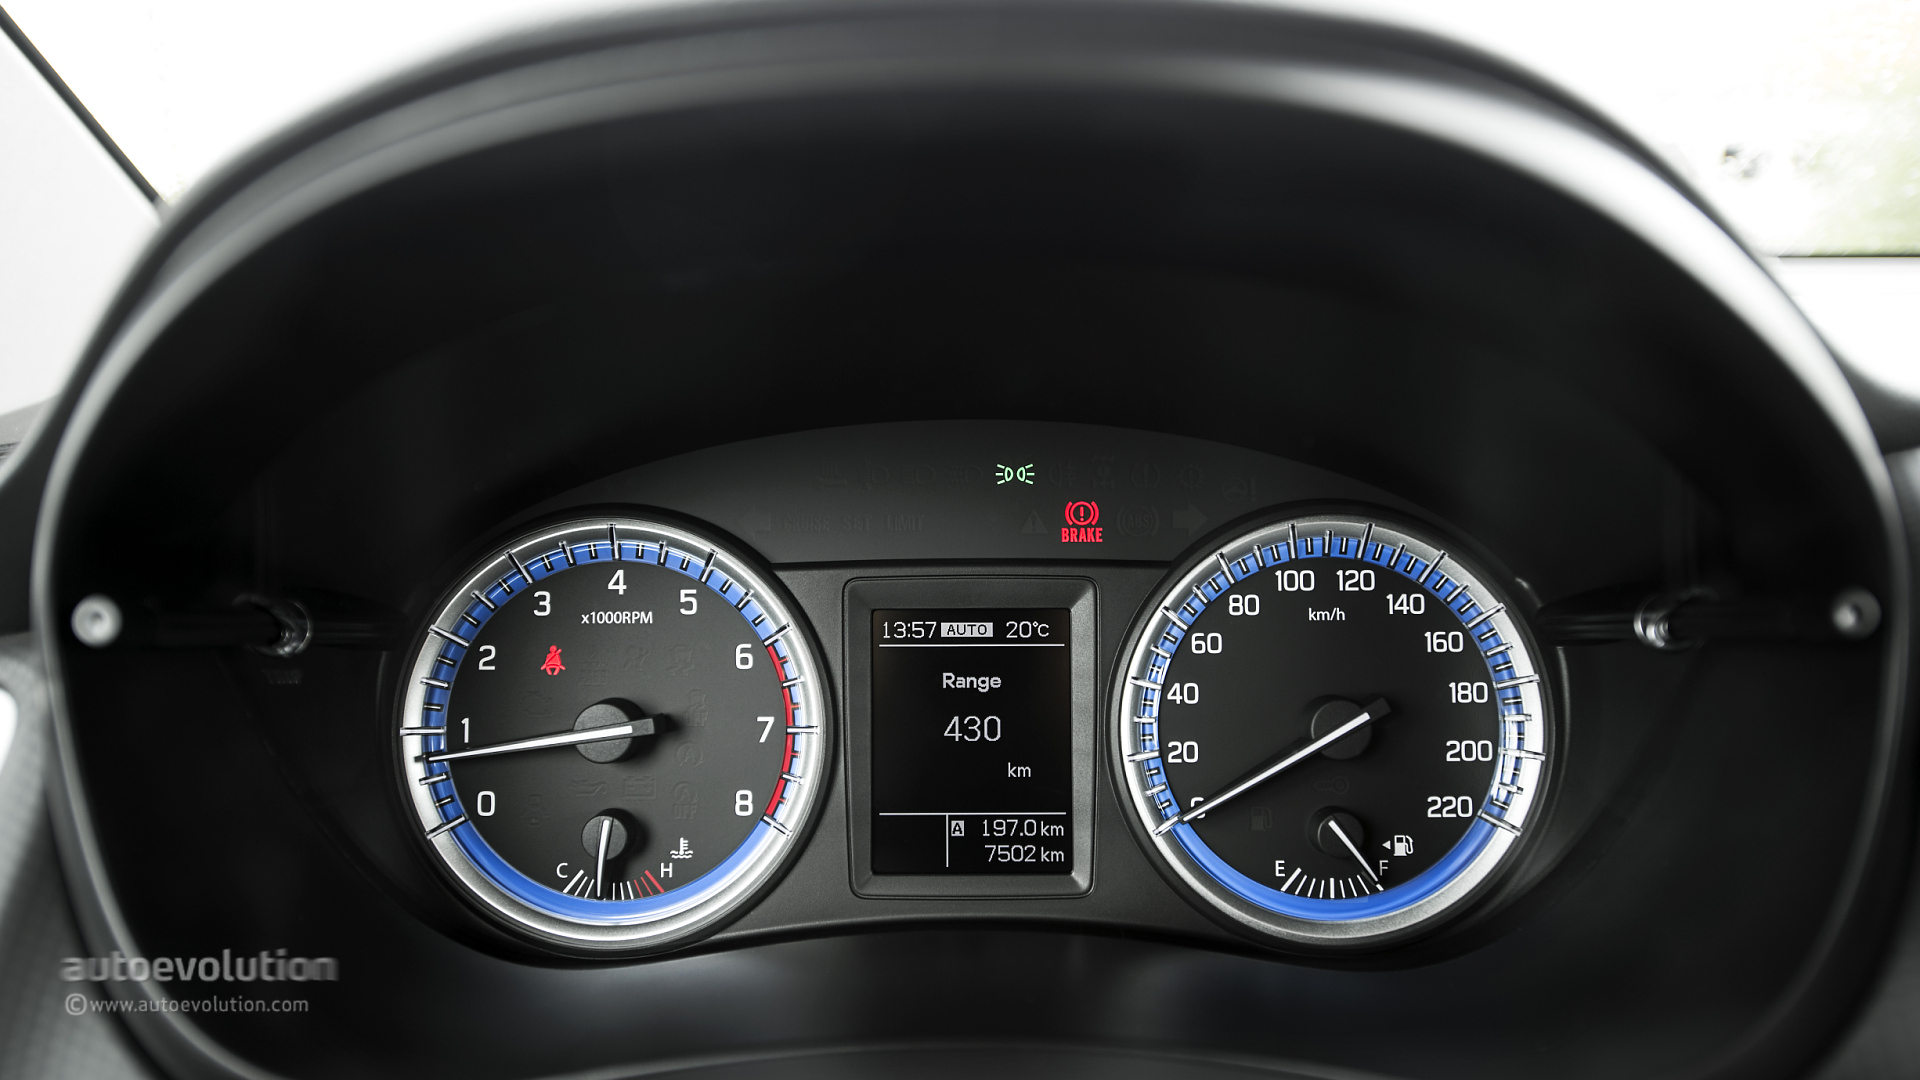 D Car Logo >> Suzuki SX4 S-Cross Review - autoevolution